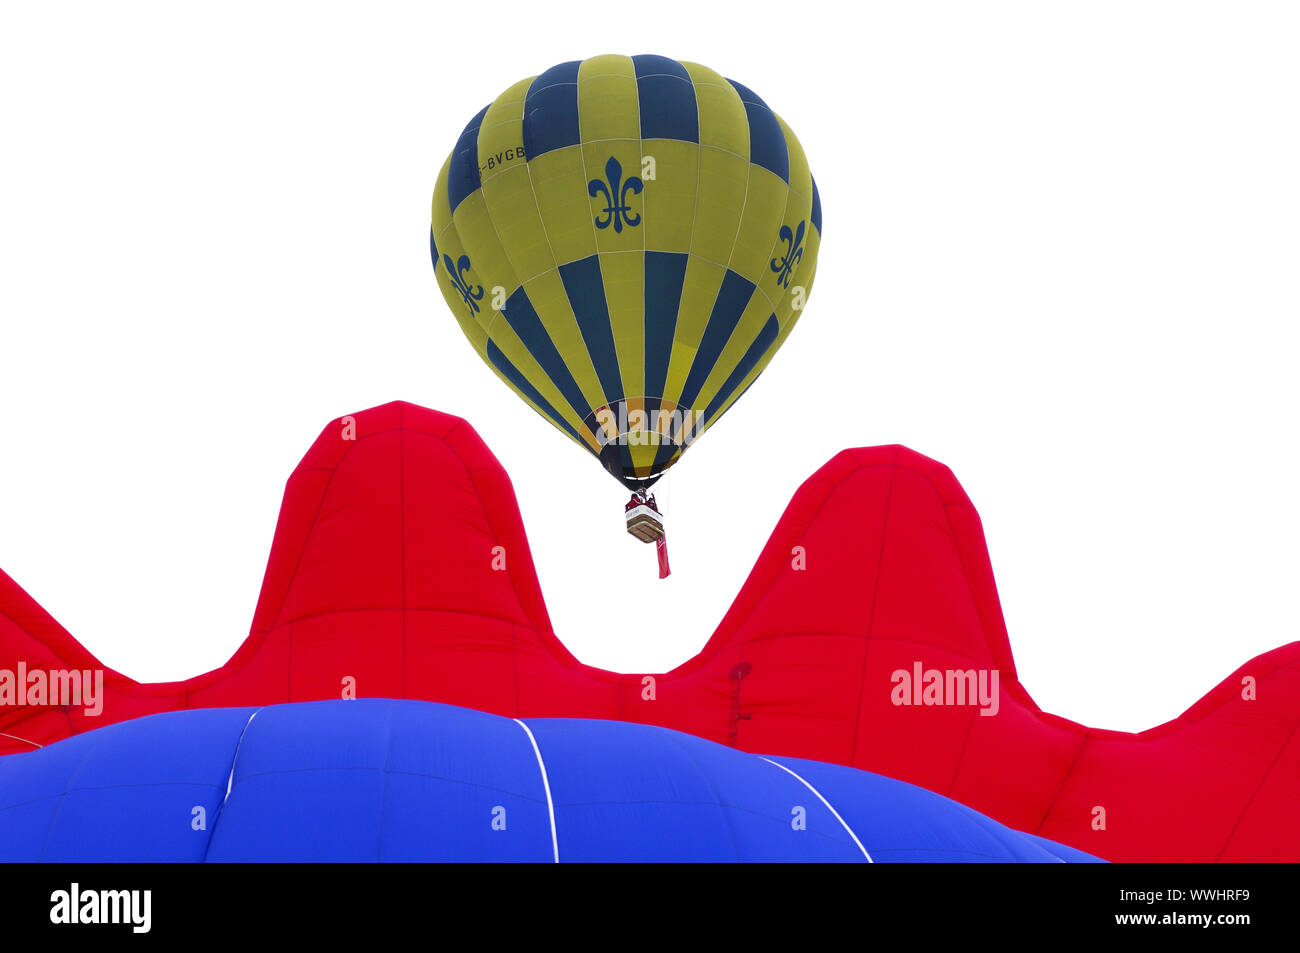 Balloon Thunder & Colt AX8-105 S2 in the air Stock Photo